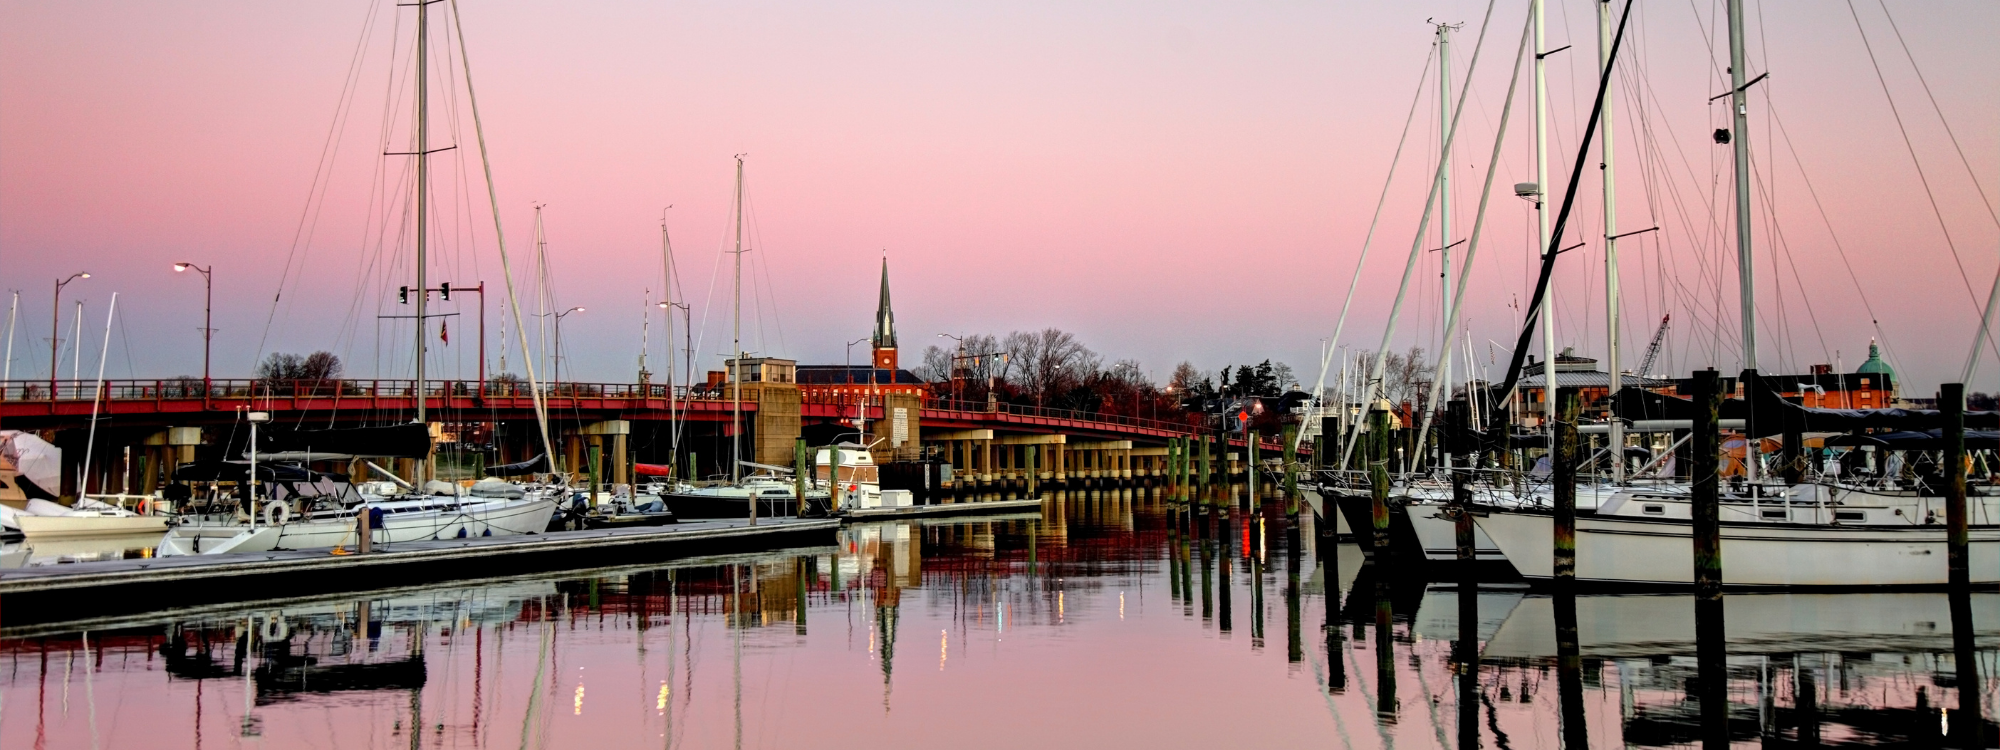 Annapolis at Dusk